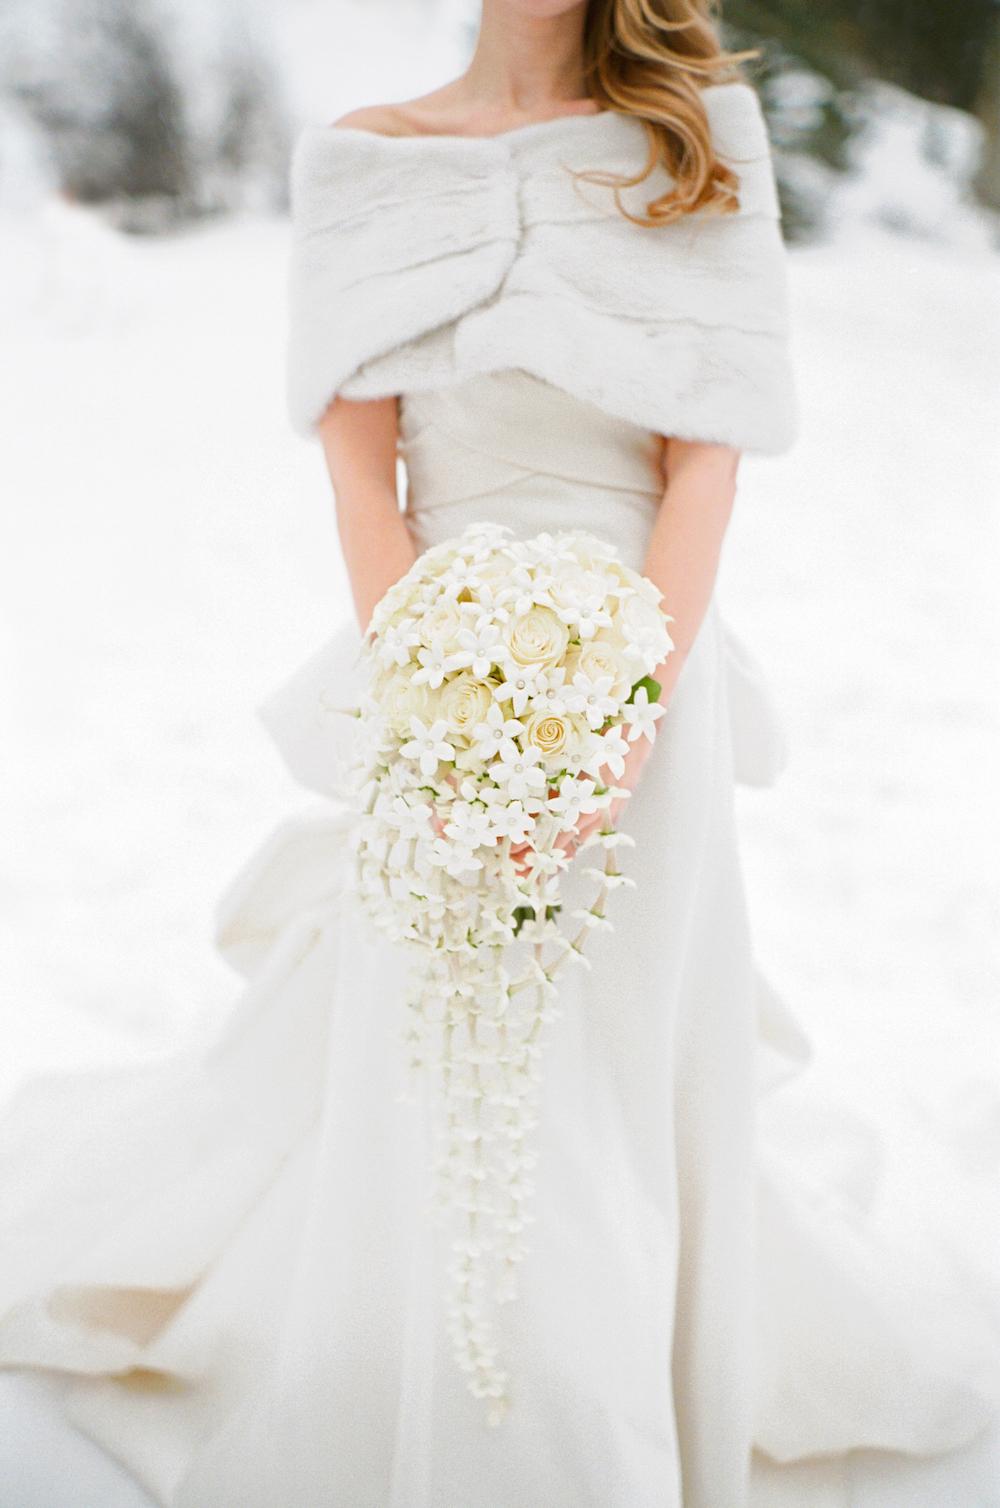 Bride in snow white dress fur bolero cascading white winter wedding bouquet